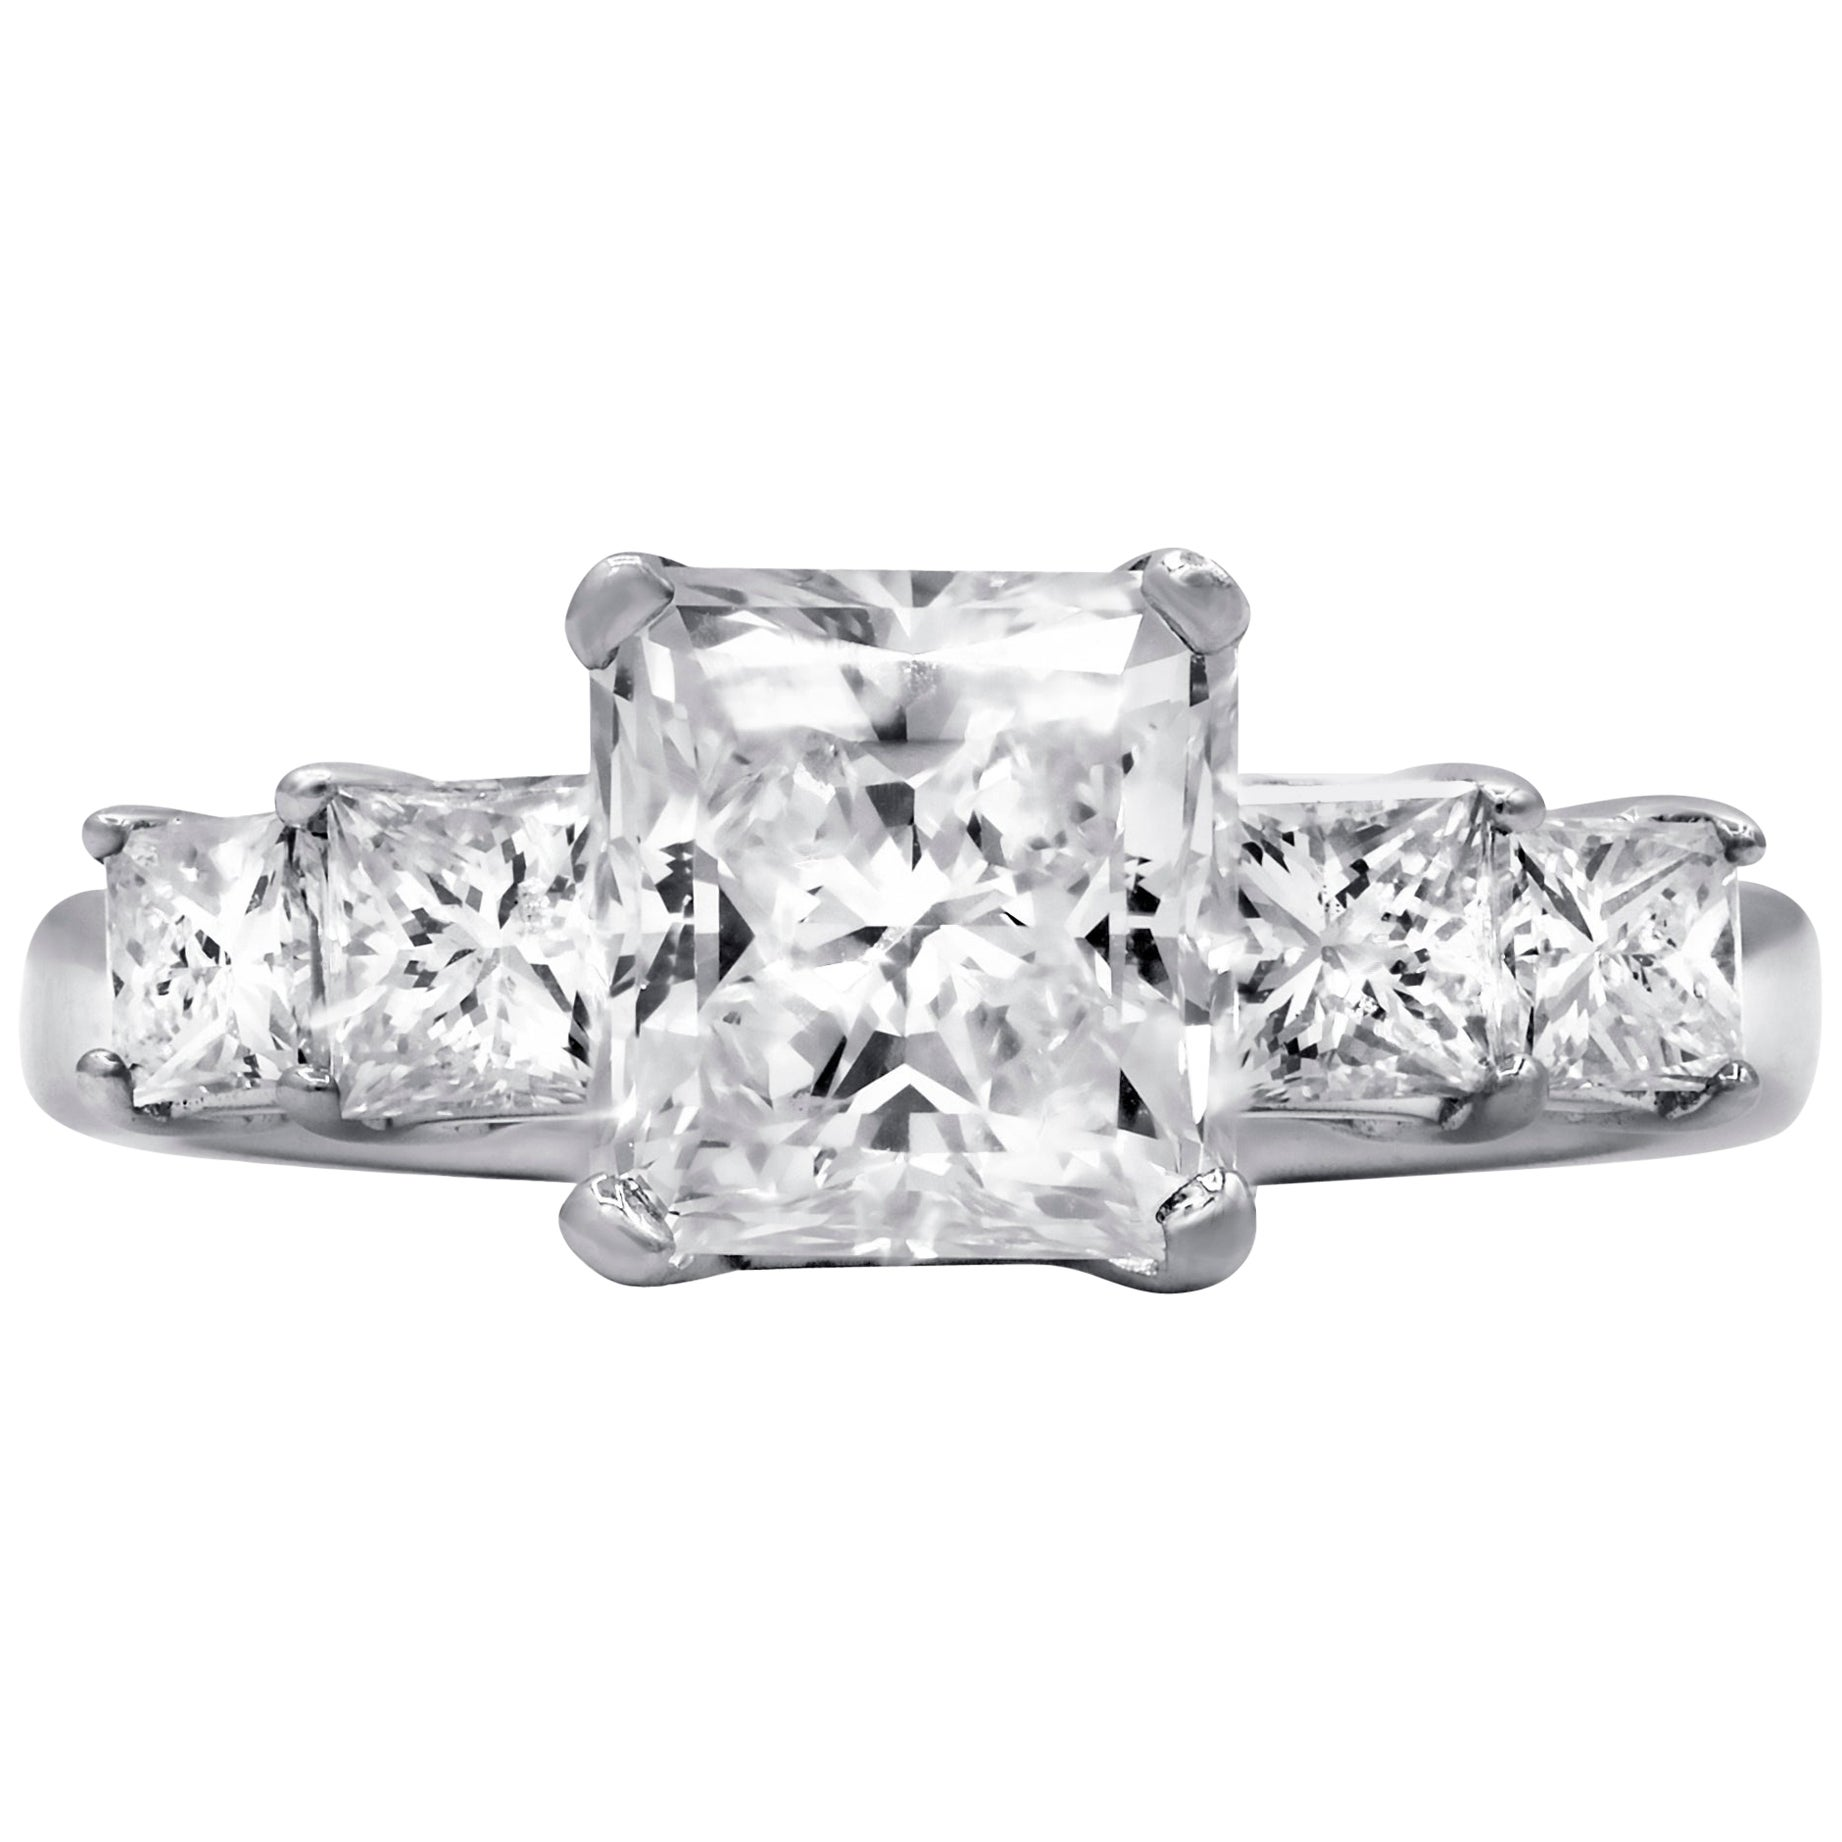 GIA Certified 3.01 Carat Radiant Cut Diamond Engagement Ring